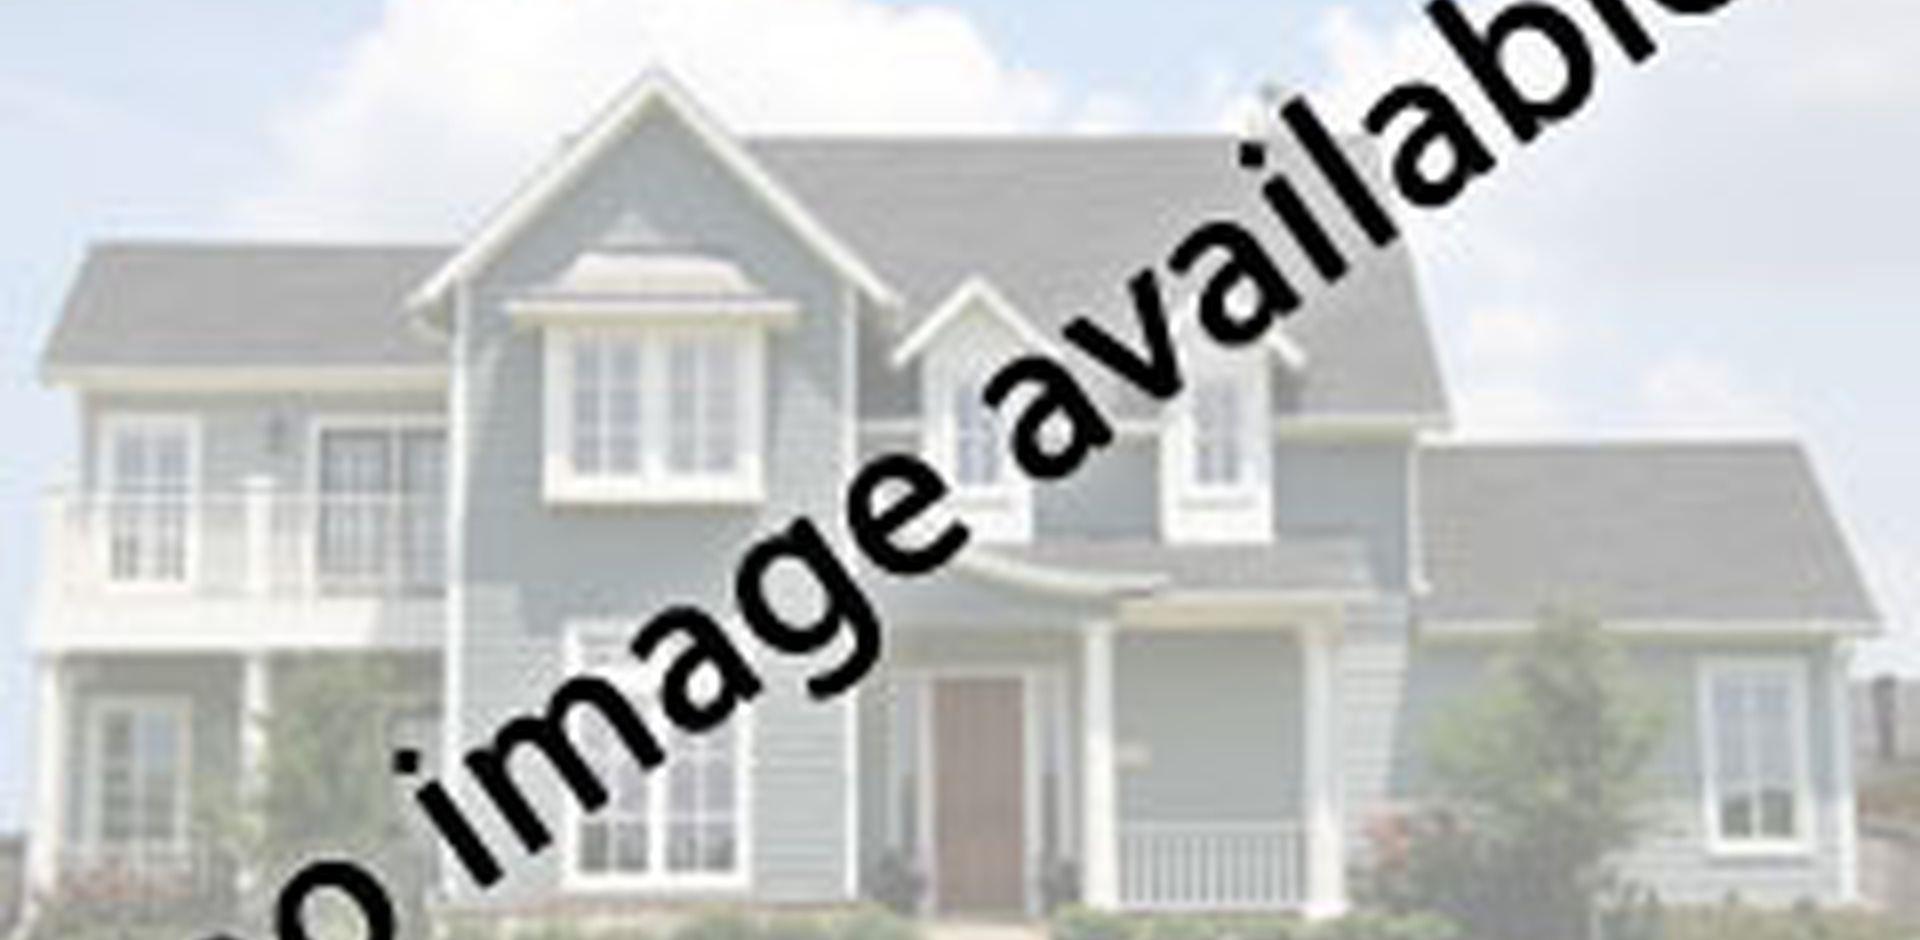 10203 Regal Oaks Drive #201 Dallas, TX 75230 - Image 1